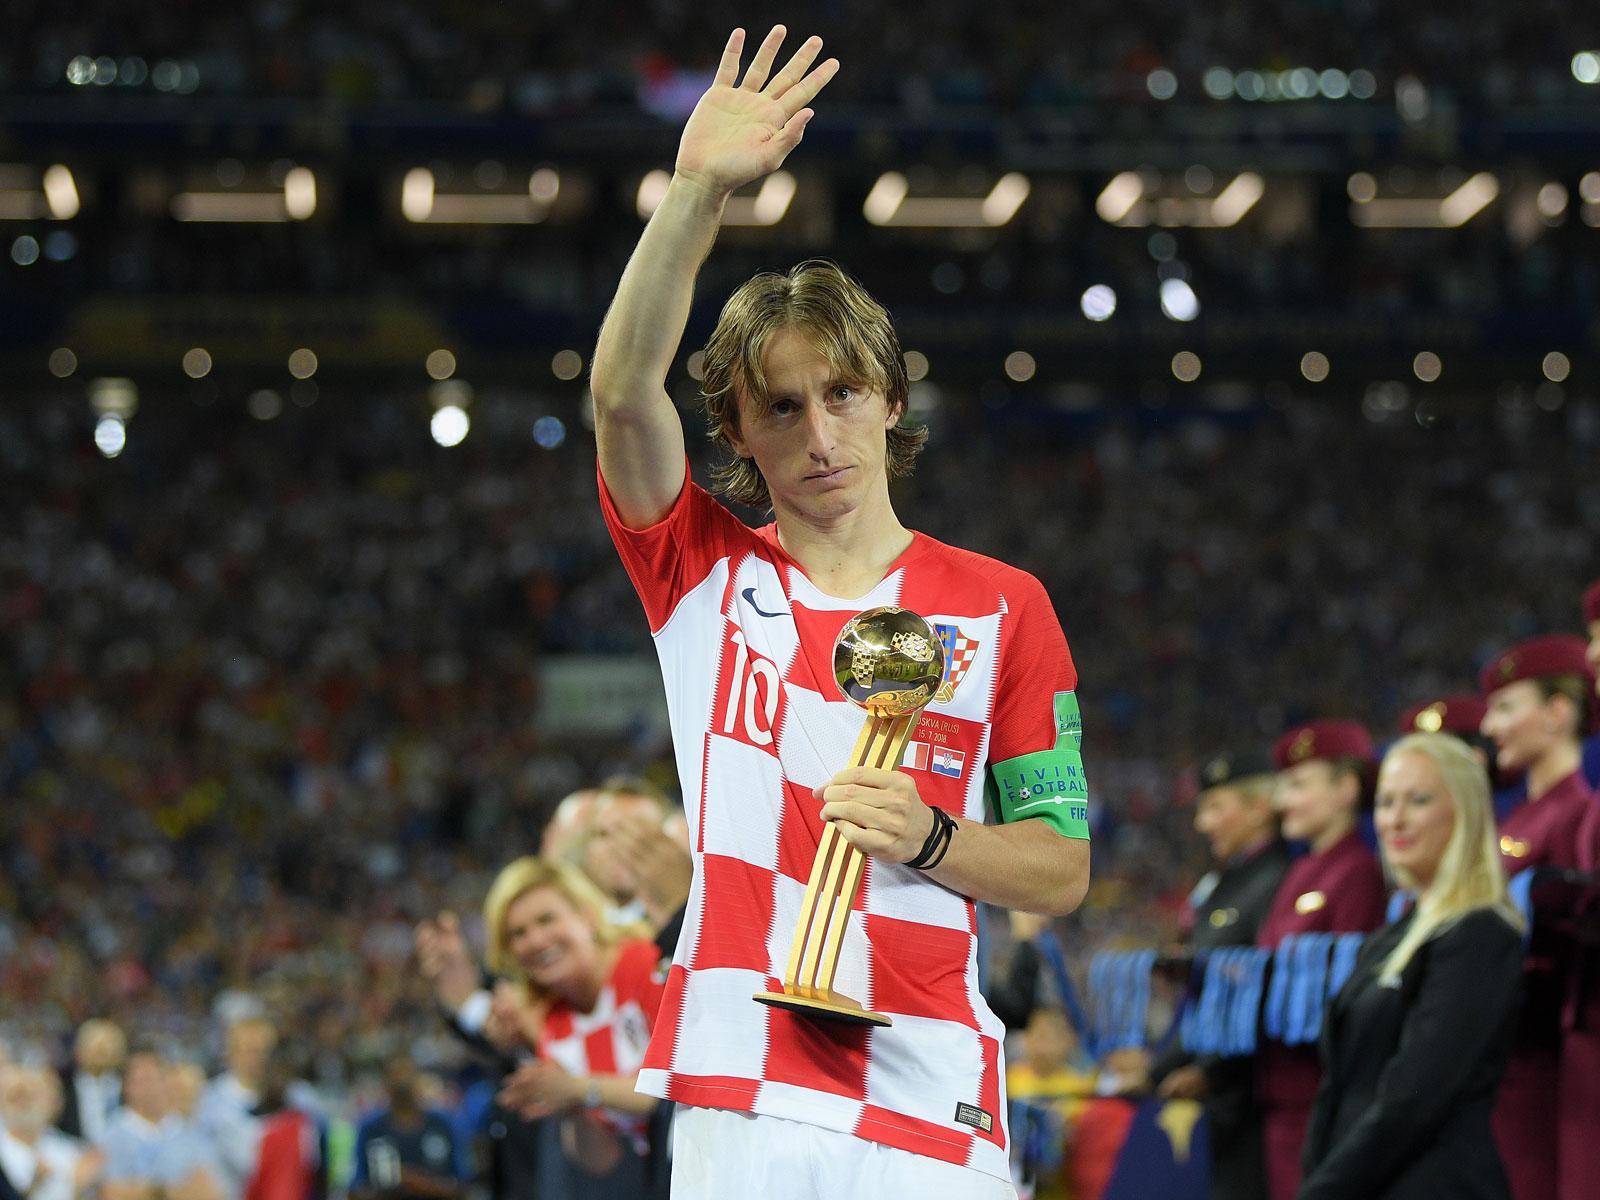 Luka Modric won the World Cup's golden ball